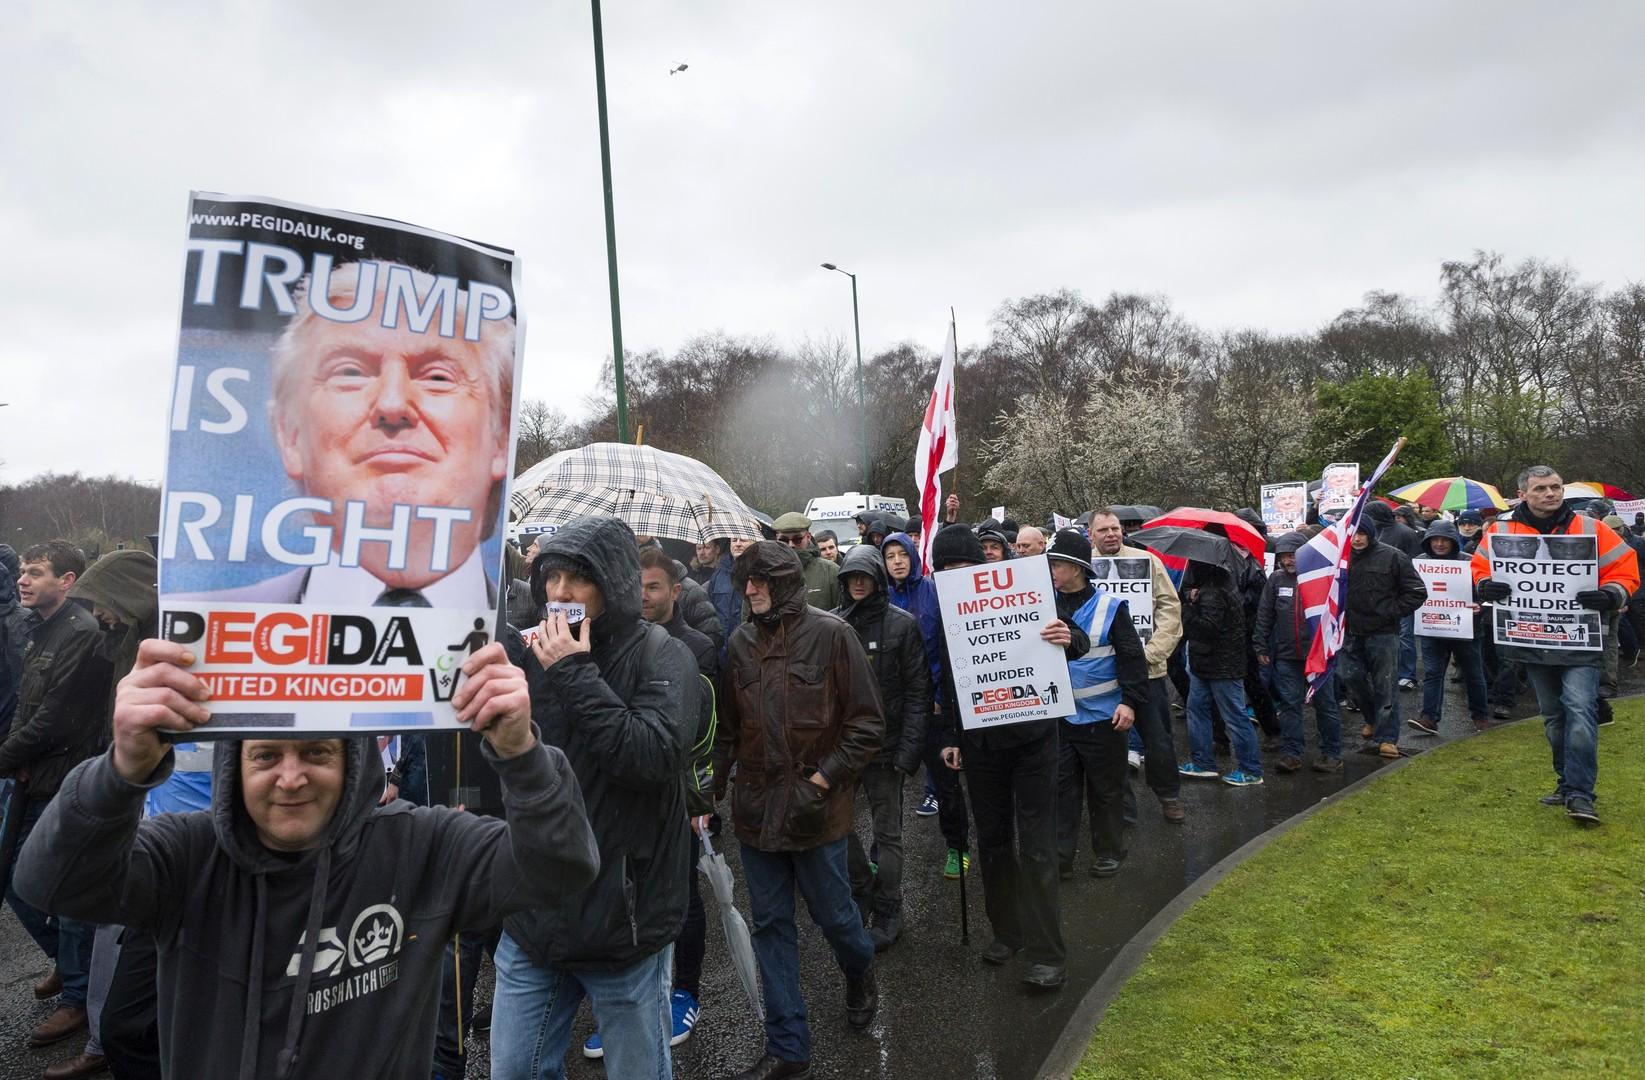 The Washington Post составила список главных Трампов Европы